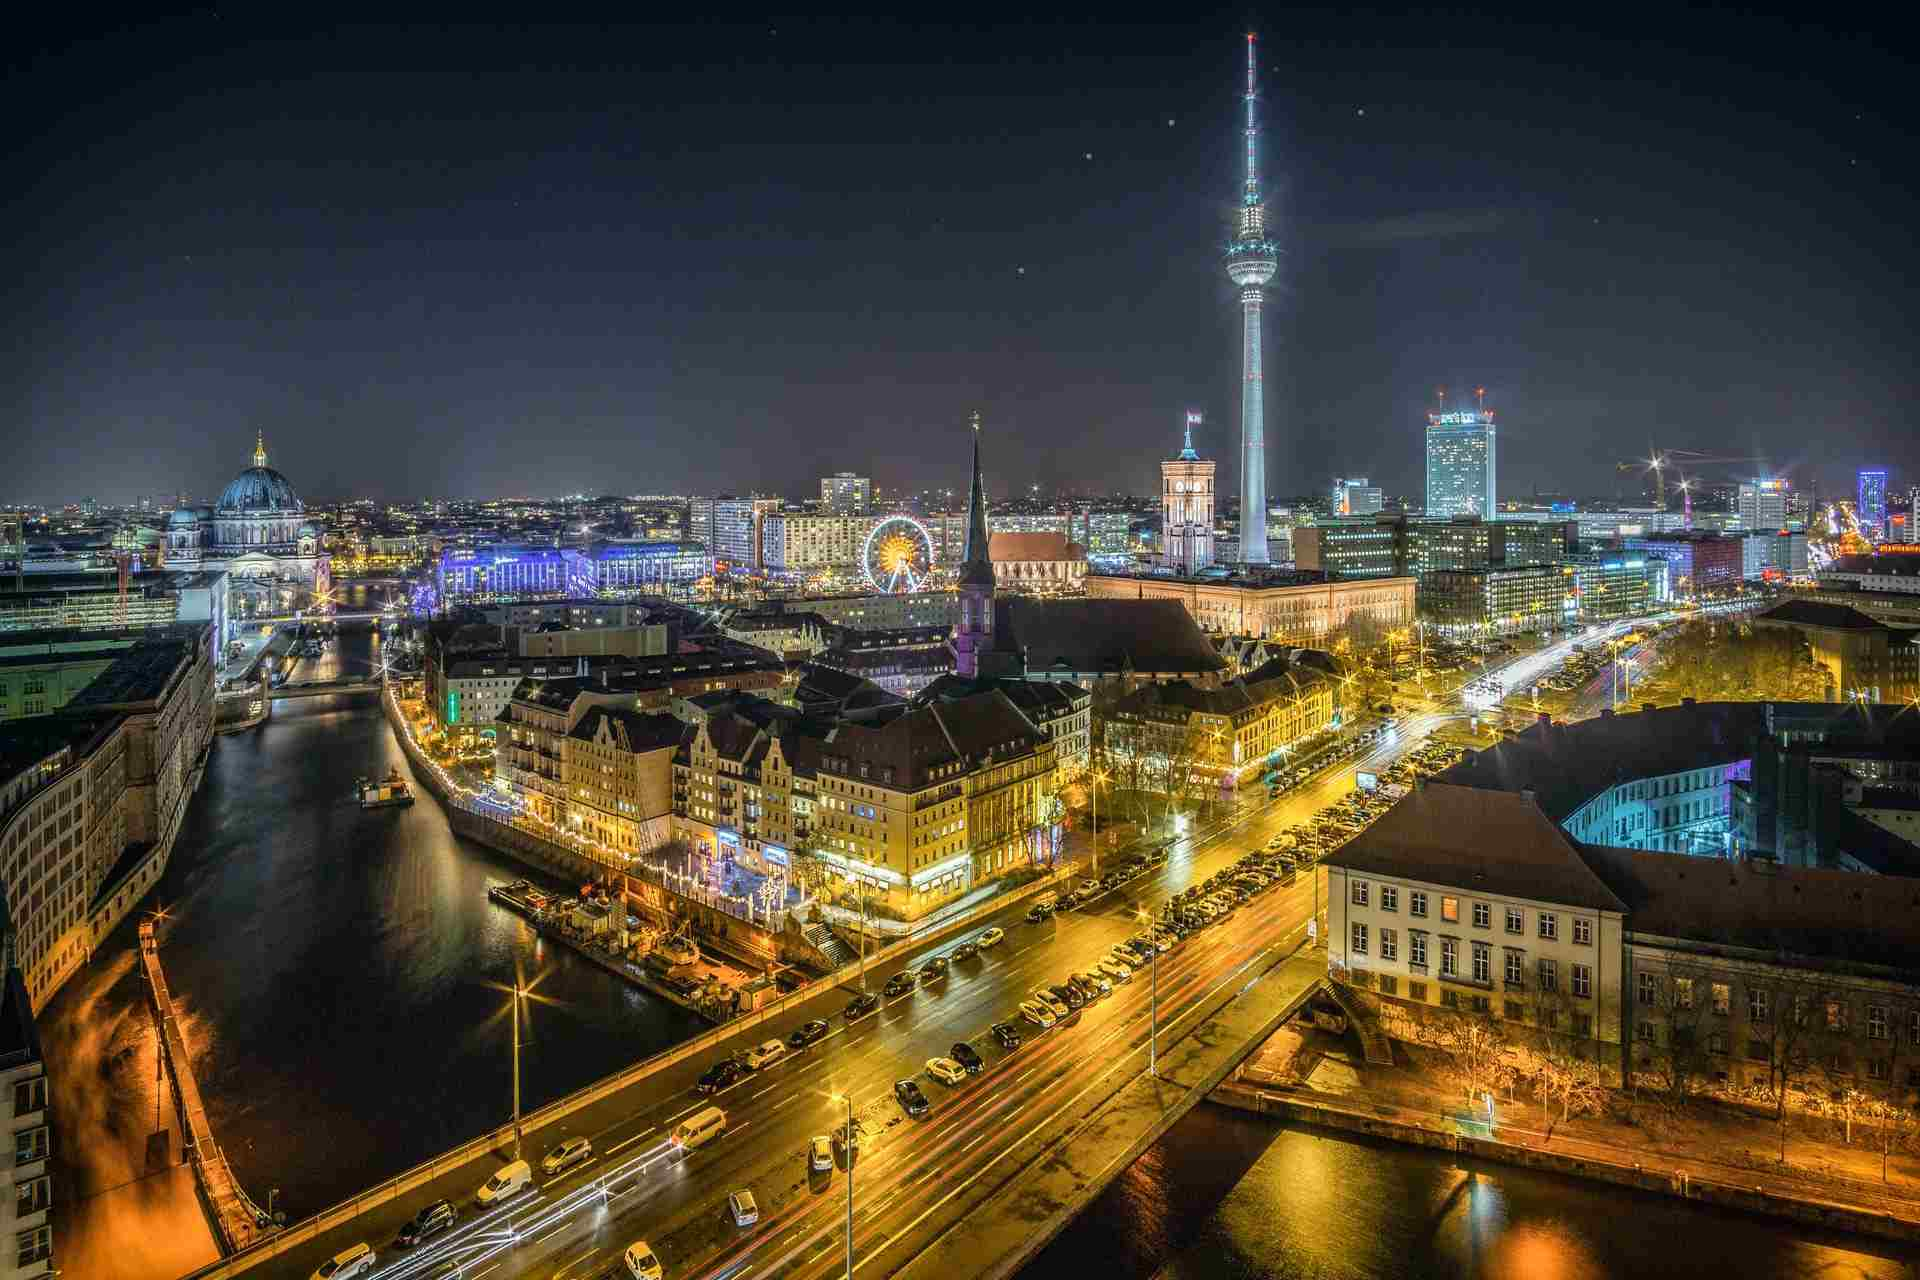 Best Berlin Walking Tour Guide: Tours That Make Zero Compromises!